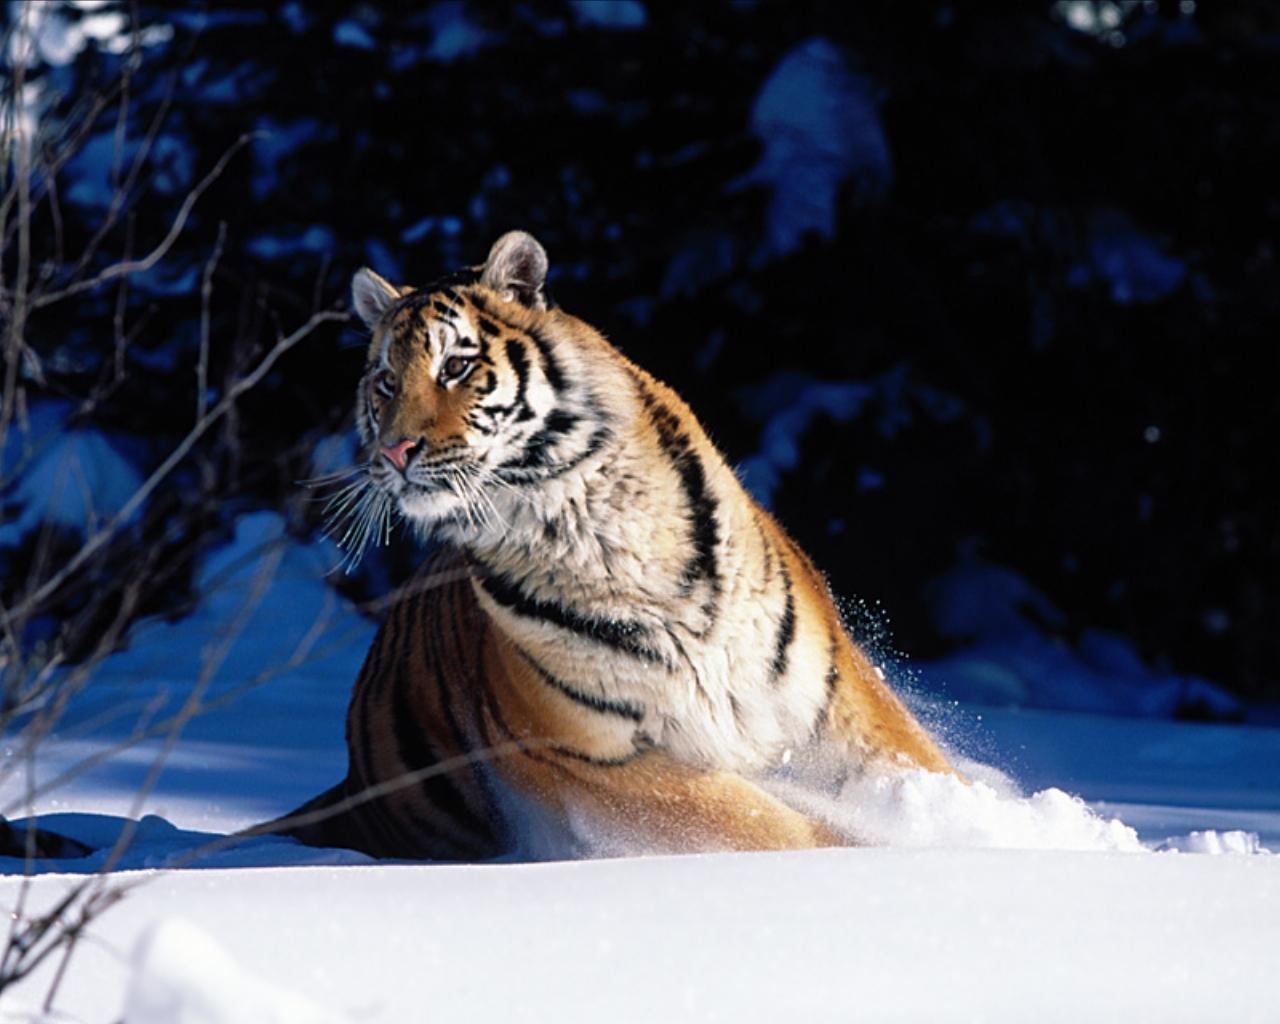 http://4.bp.blogspot.com/-yZEmsSVMe4s/UFXwxNaqLMI/AAAAAAAAEO0/4cbArGSDaqE/s1600/siberian-tiger-in-snow.jpg